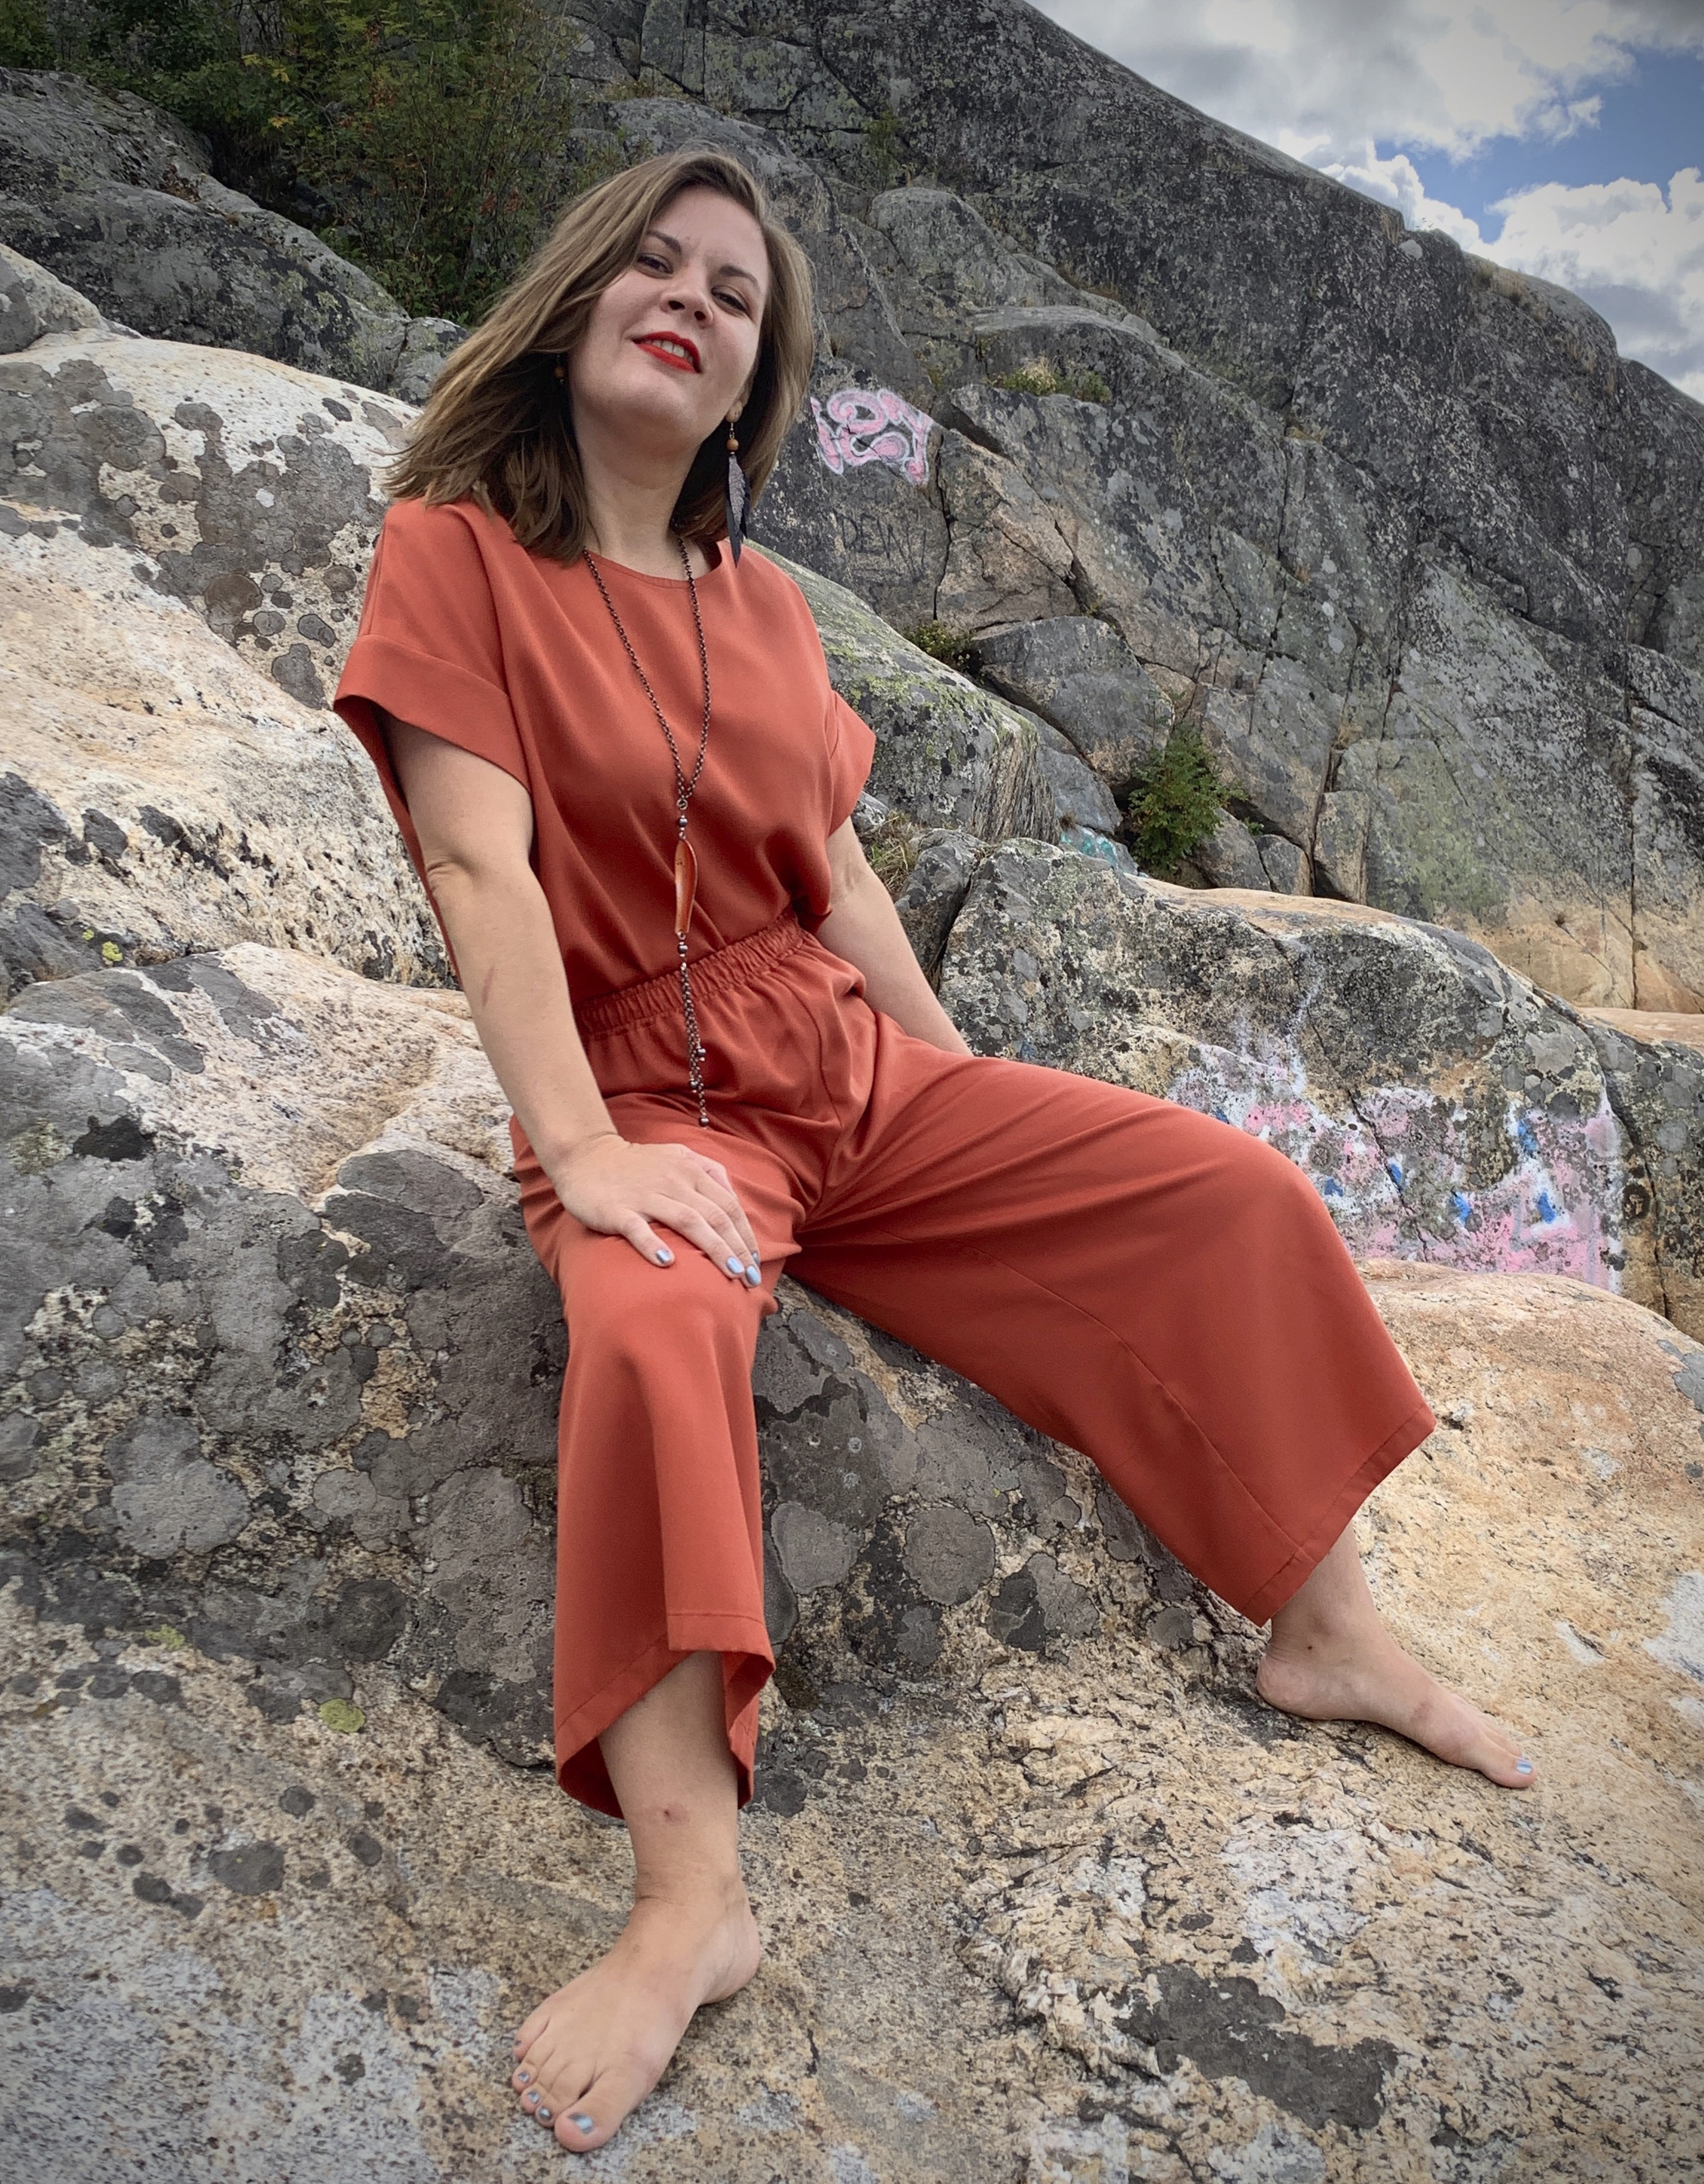 Vuurran: Ilmatar-culottes, tiilenpunainen